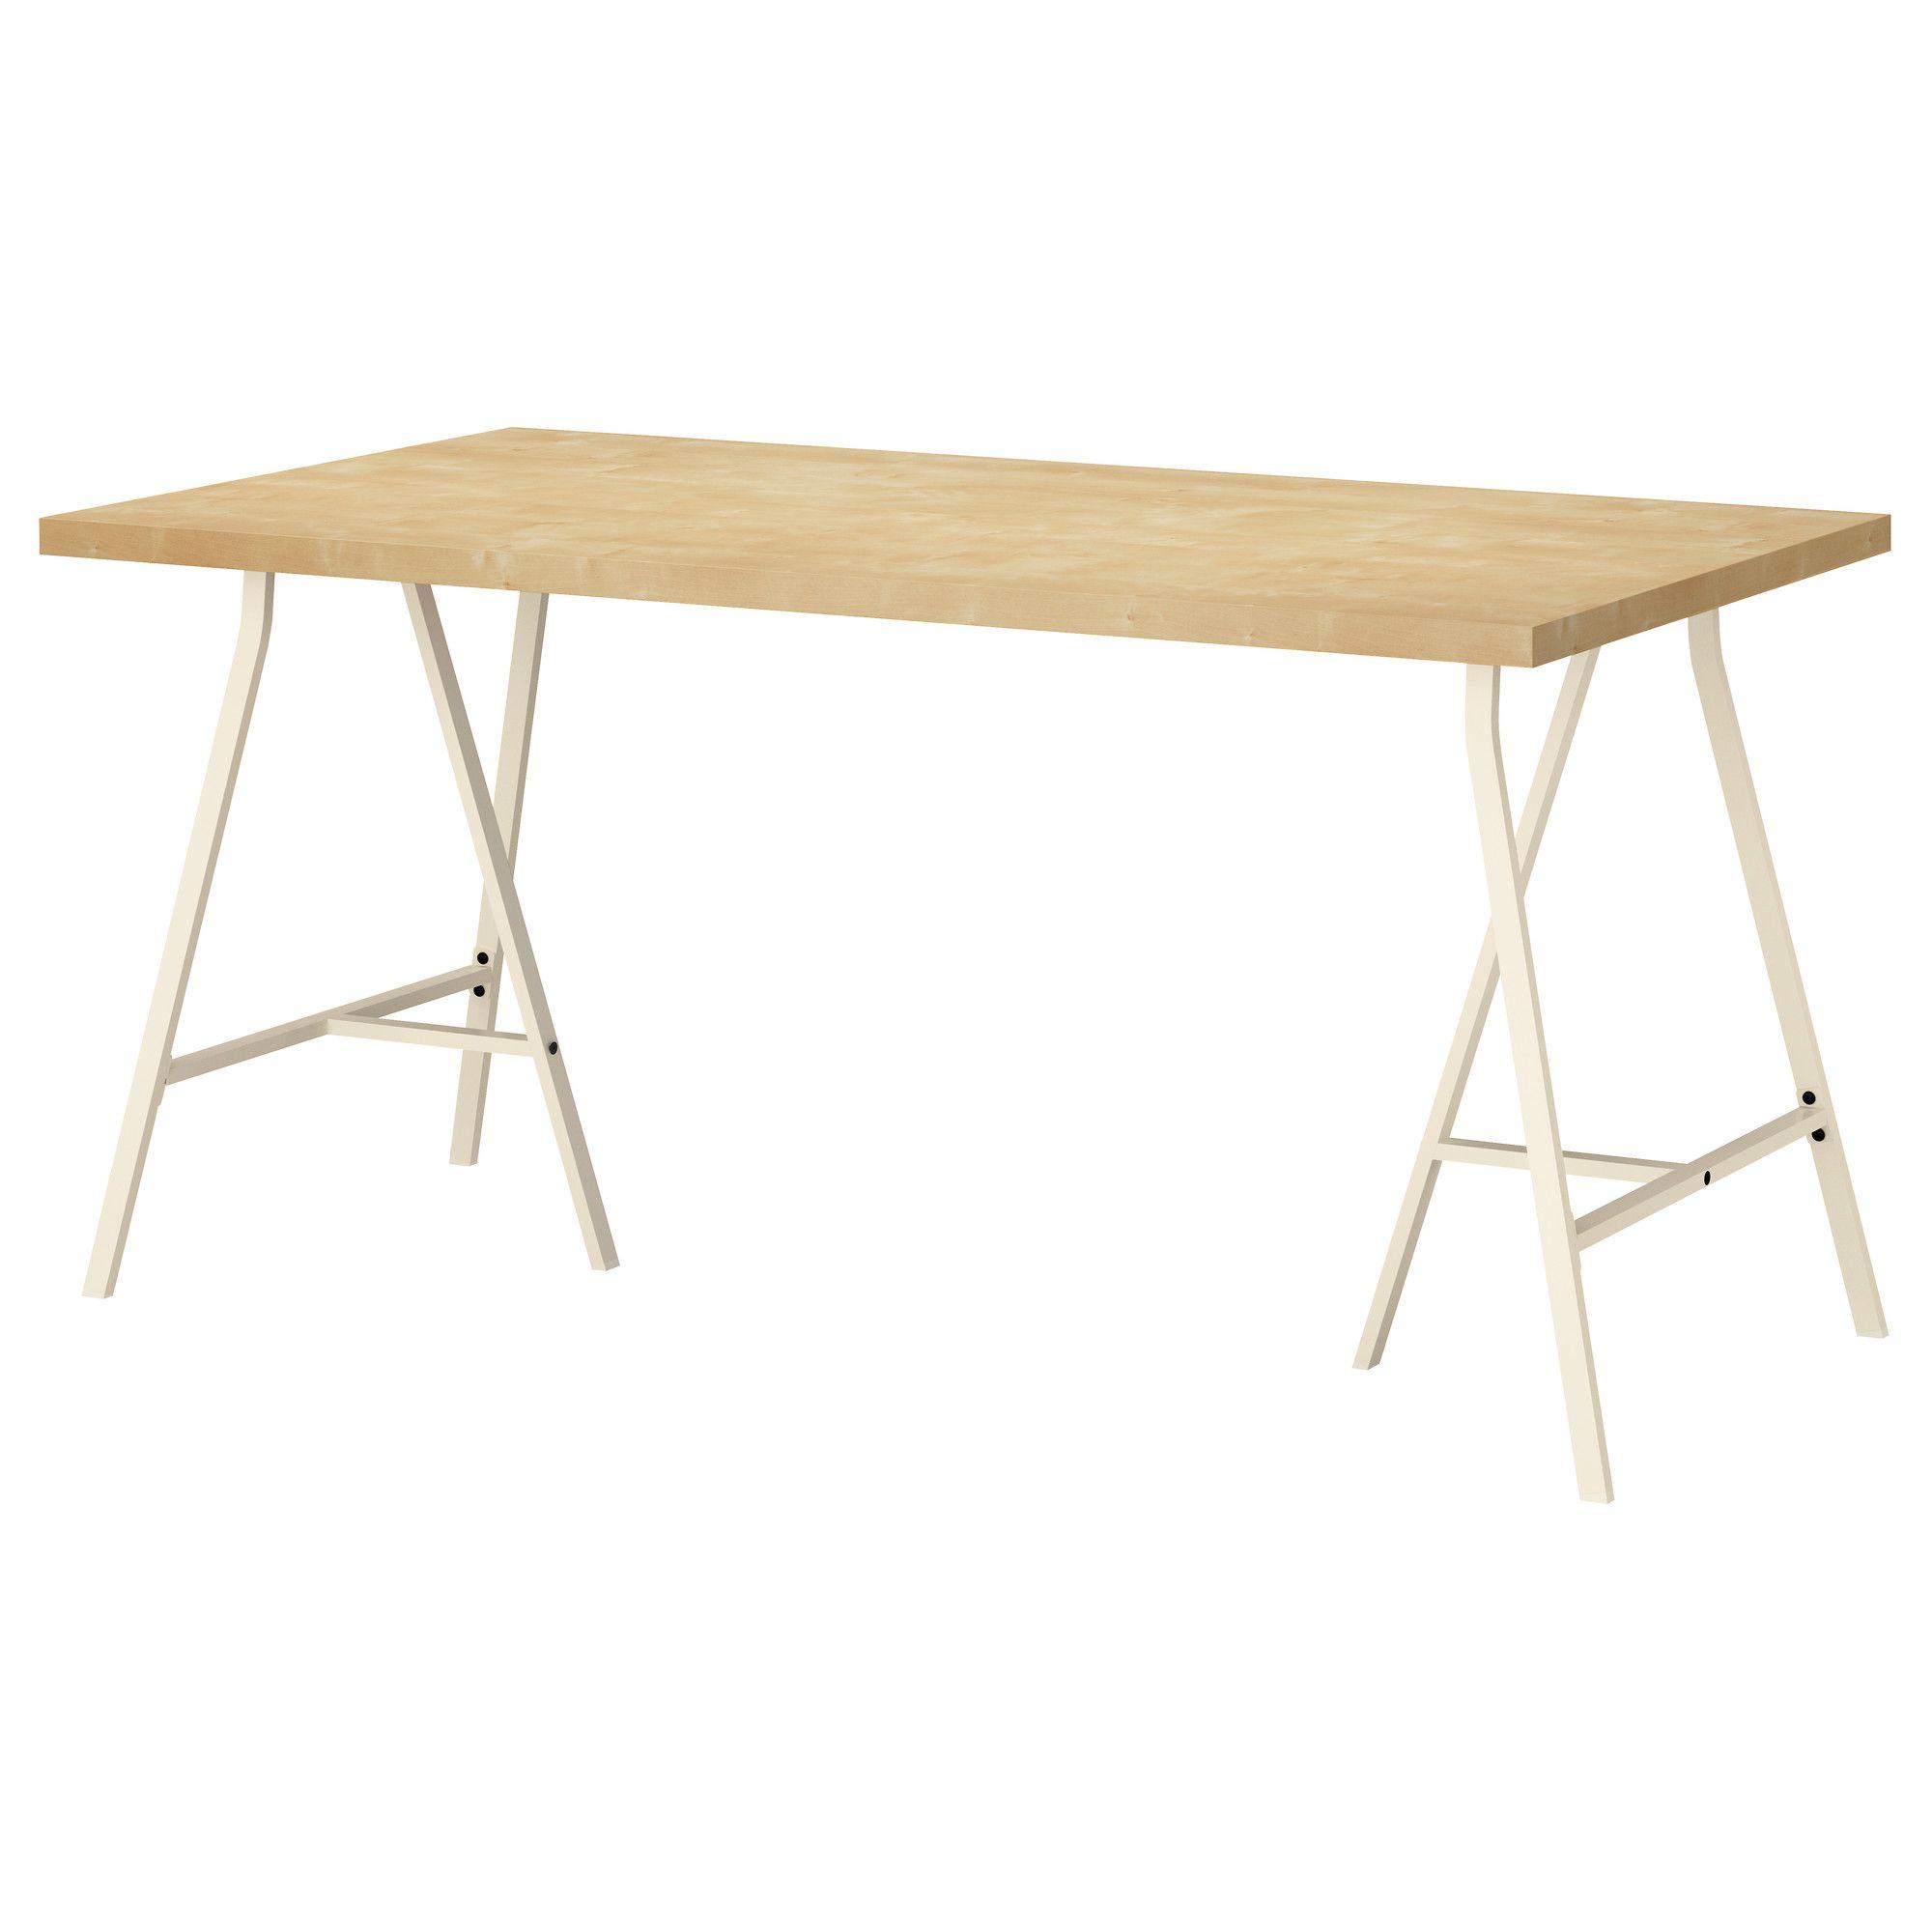 Linnmon lerberg table eff bouleau blanc ikea salon table table ikea plateau de table - Table salon blanc ikea ...